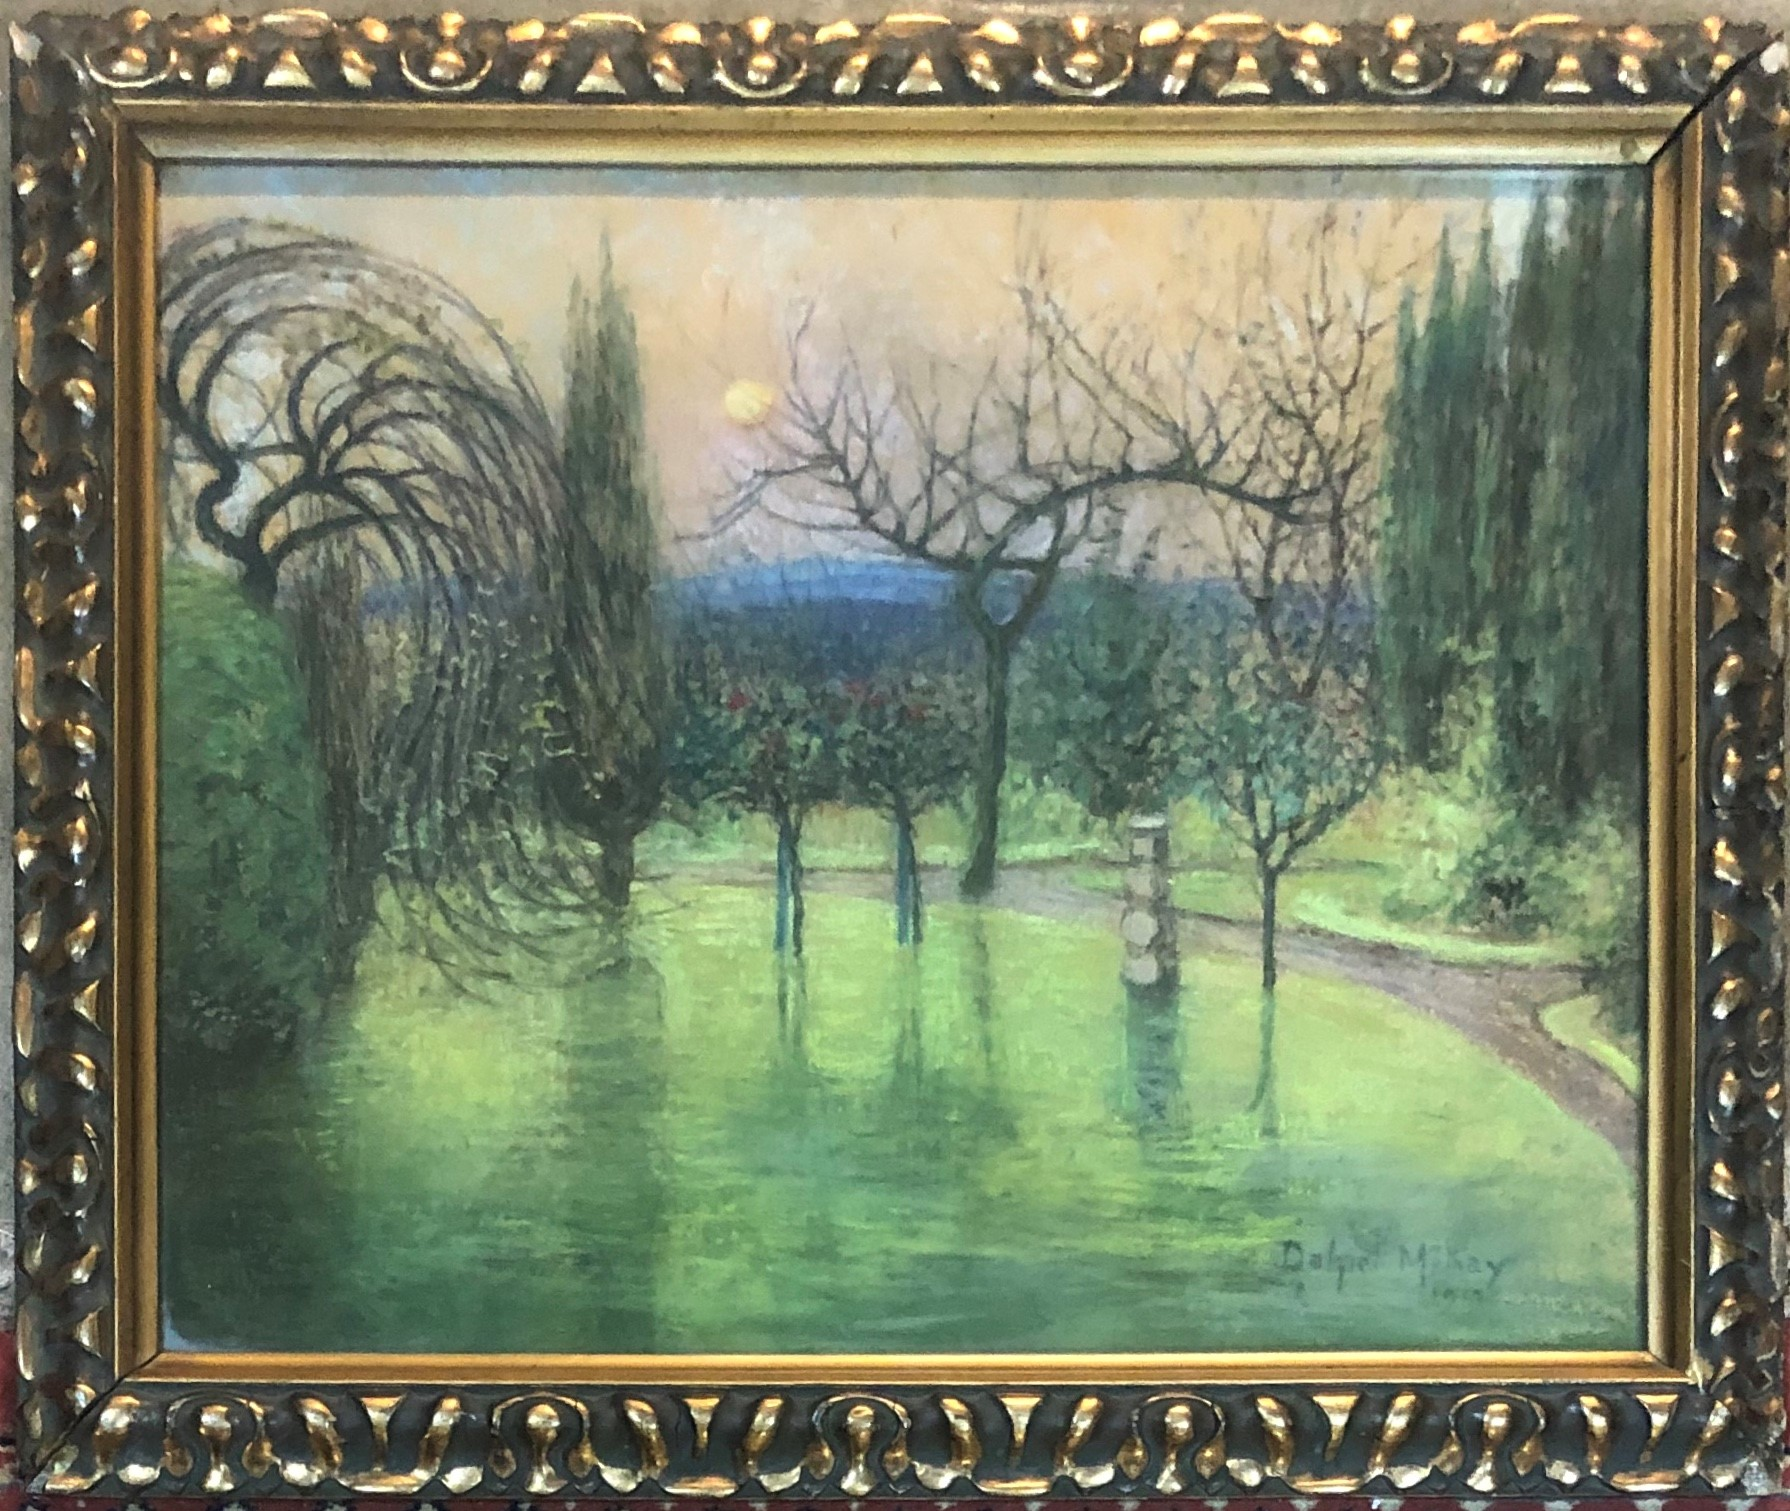 Lot 512 - D MCKAY 1913, PASTEL OF A GARDEN SCENE Gilt framed and glazed 59 x 48 cm